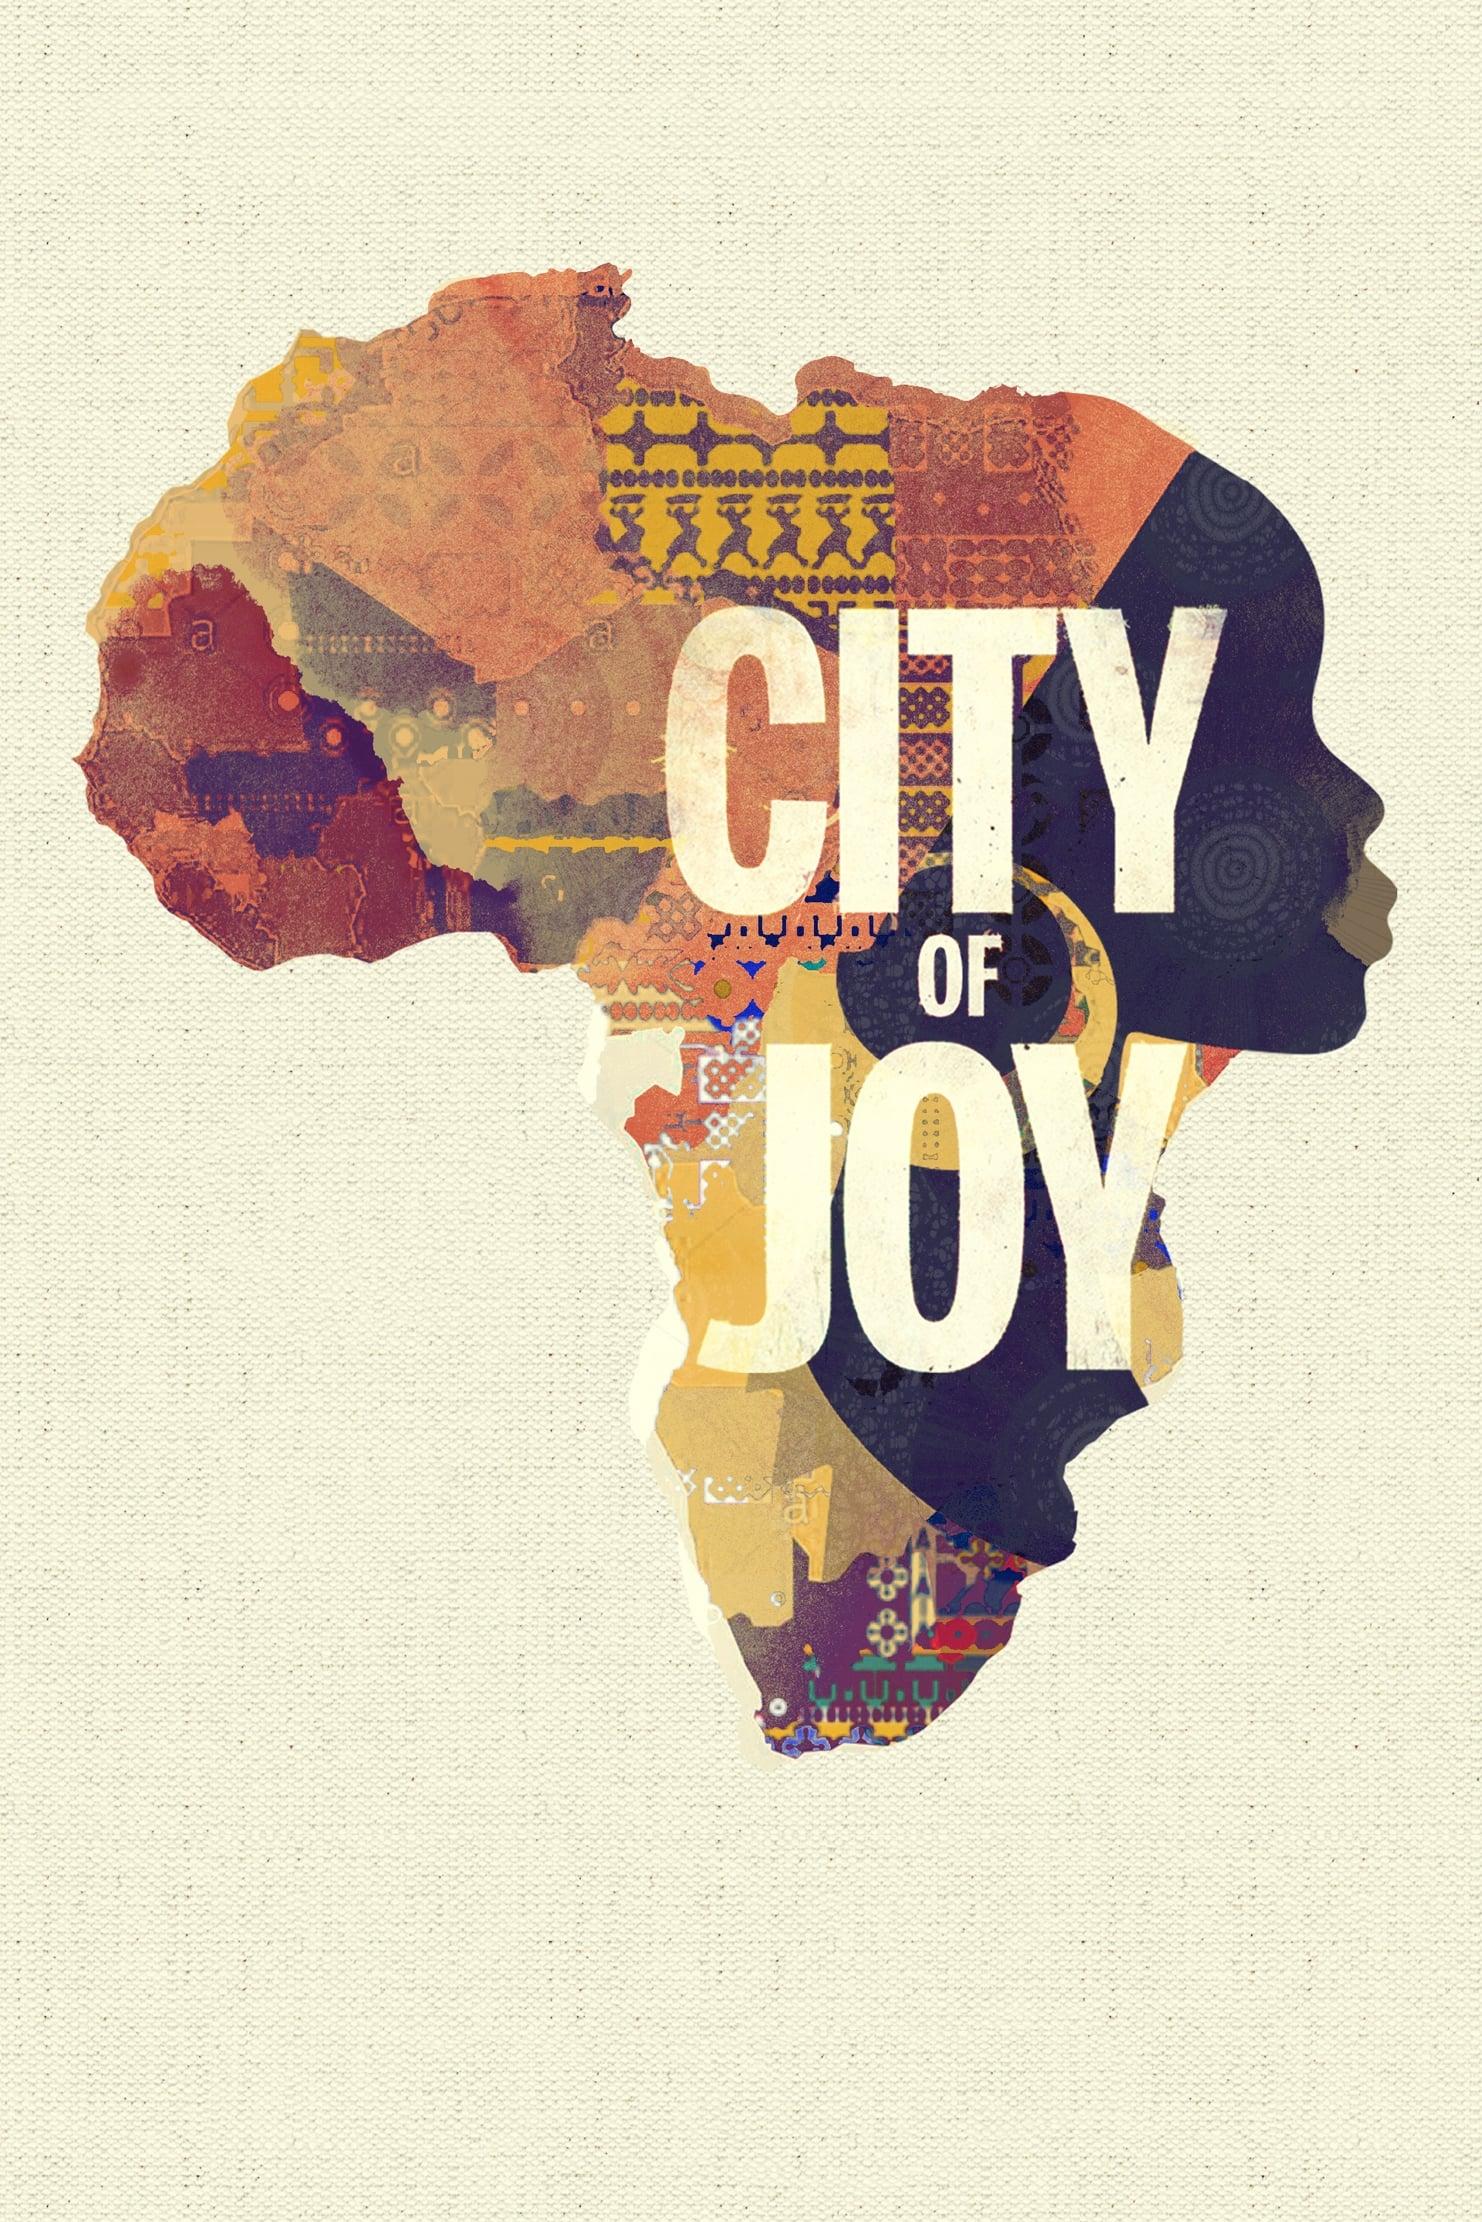 City of Joy: Onde Vive a Esperança